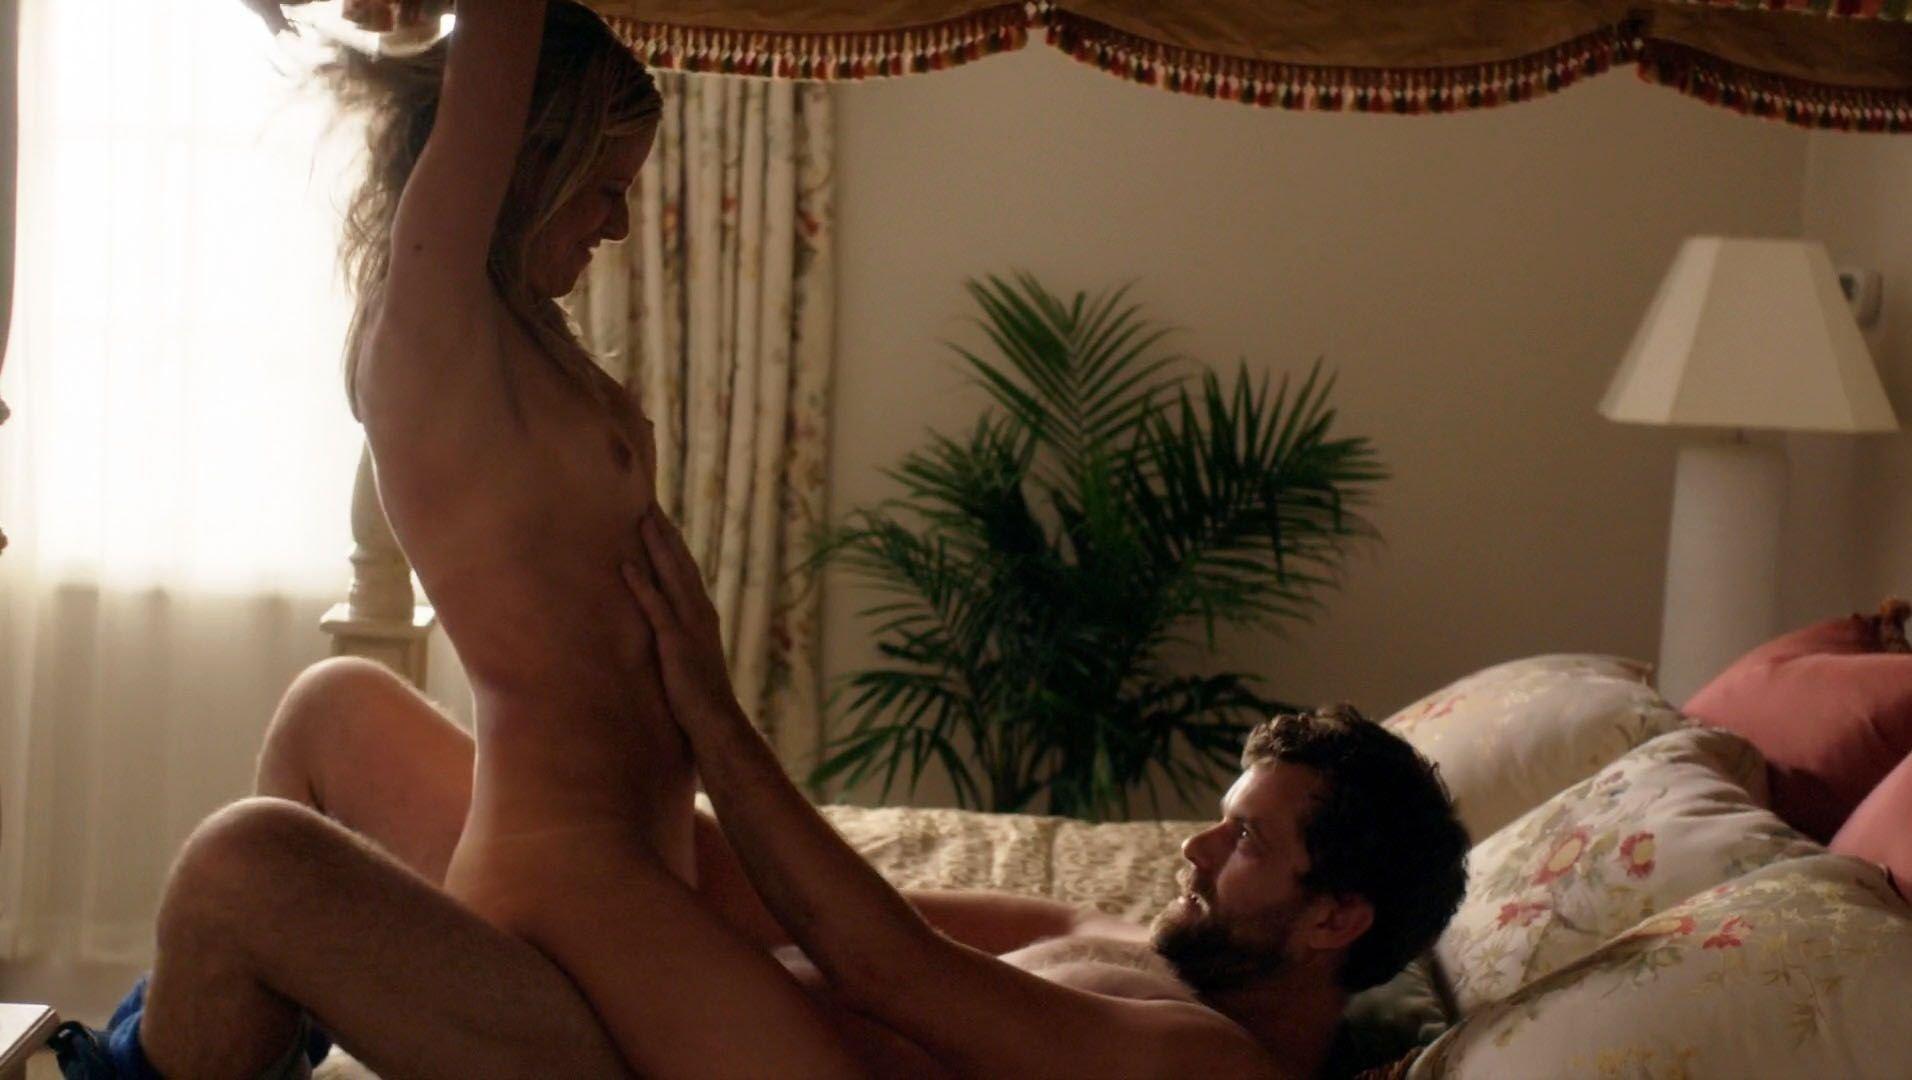 Fuck Kelly Deadmon nudes (81 photos), Topless, Fappening, Feet, braless 2015